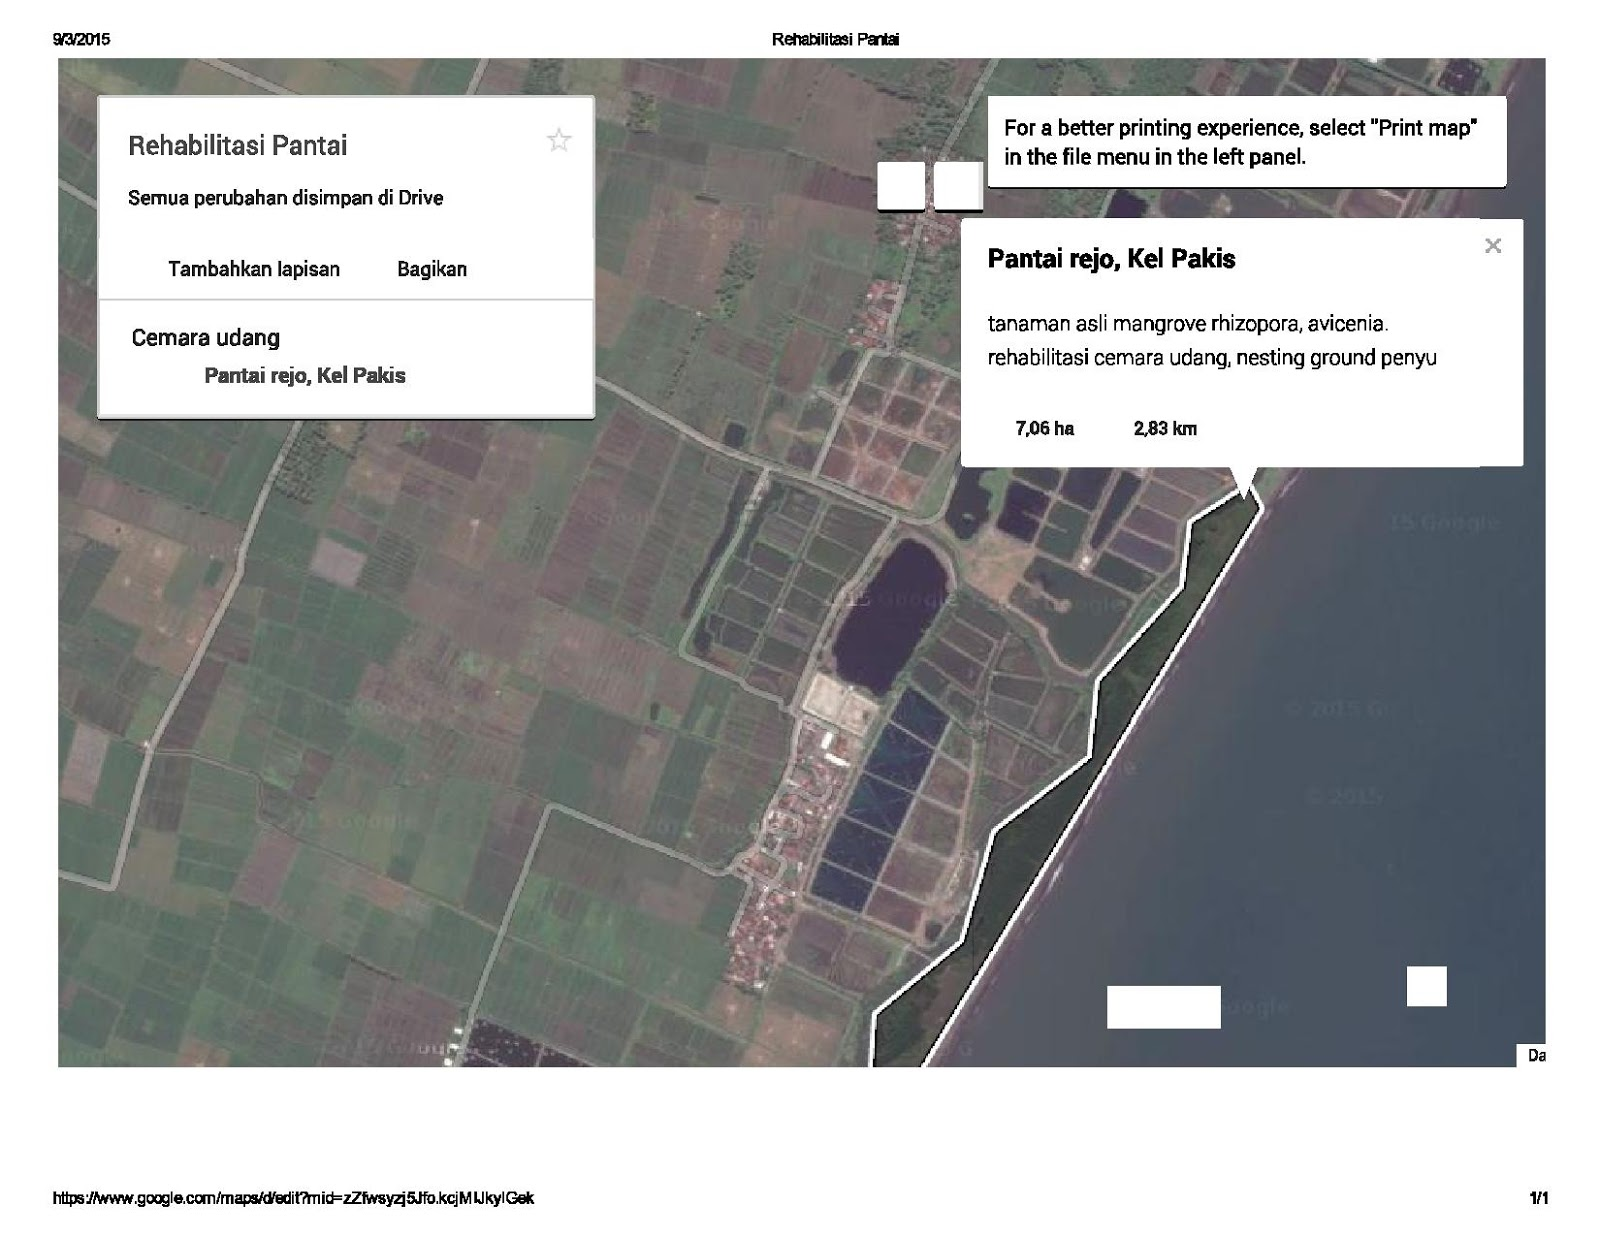 Bid Perikanan Tangkap Disperipangan Banyuwangi Rehabilitasi Pantai Konservasi Penyu Cemara